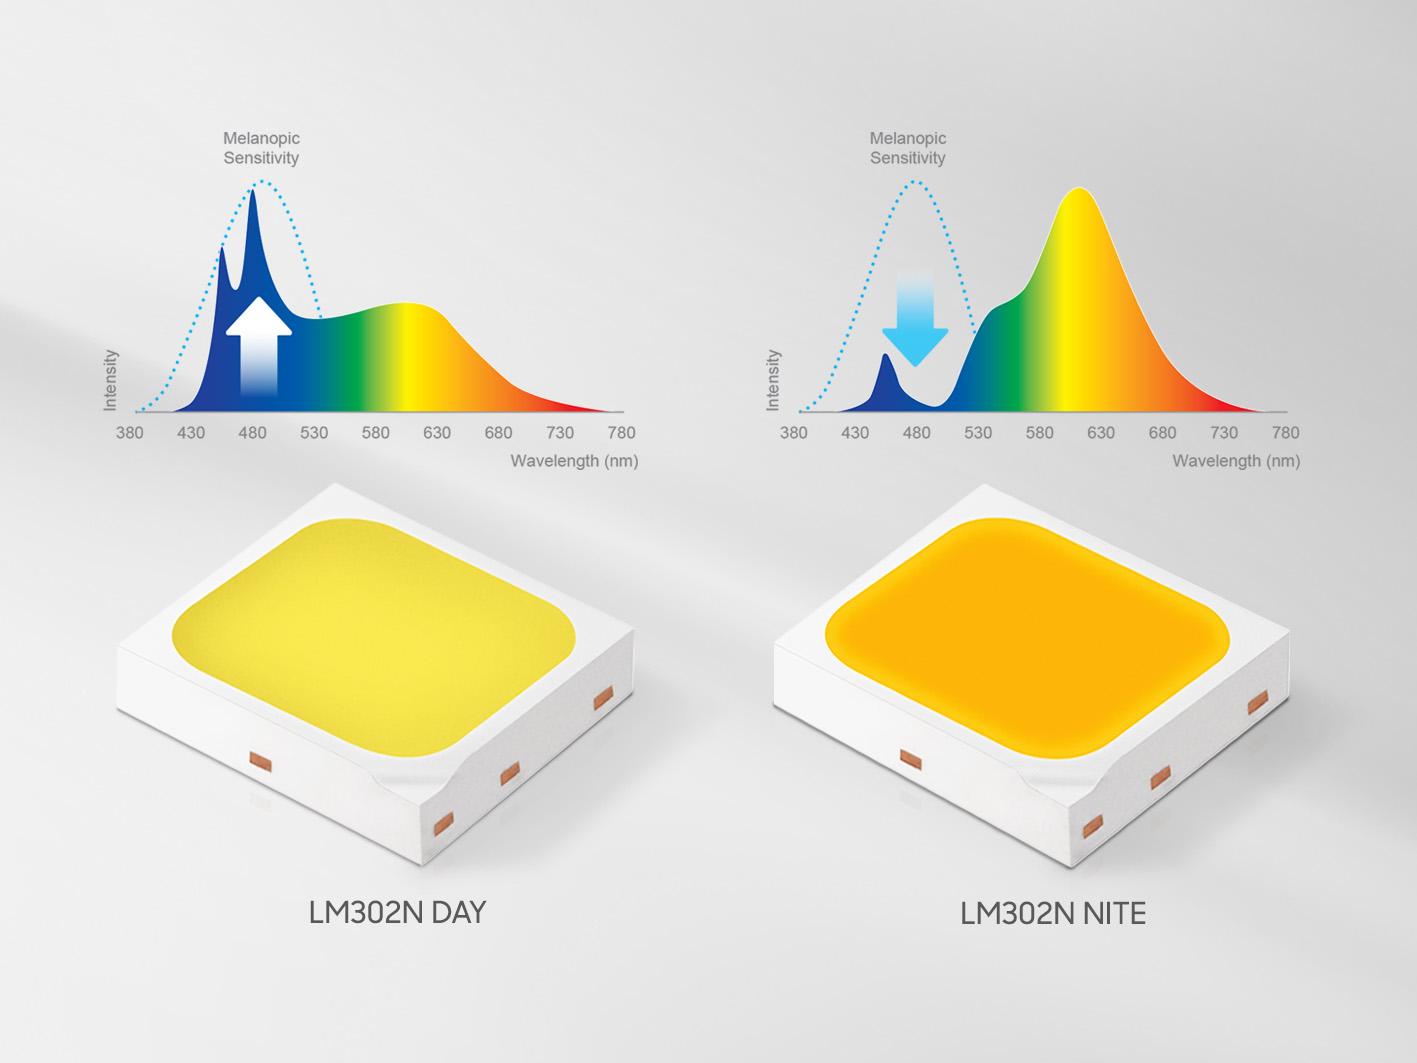 Samsung Human-centric LED - LM302N